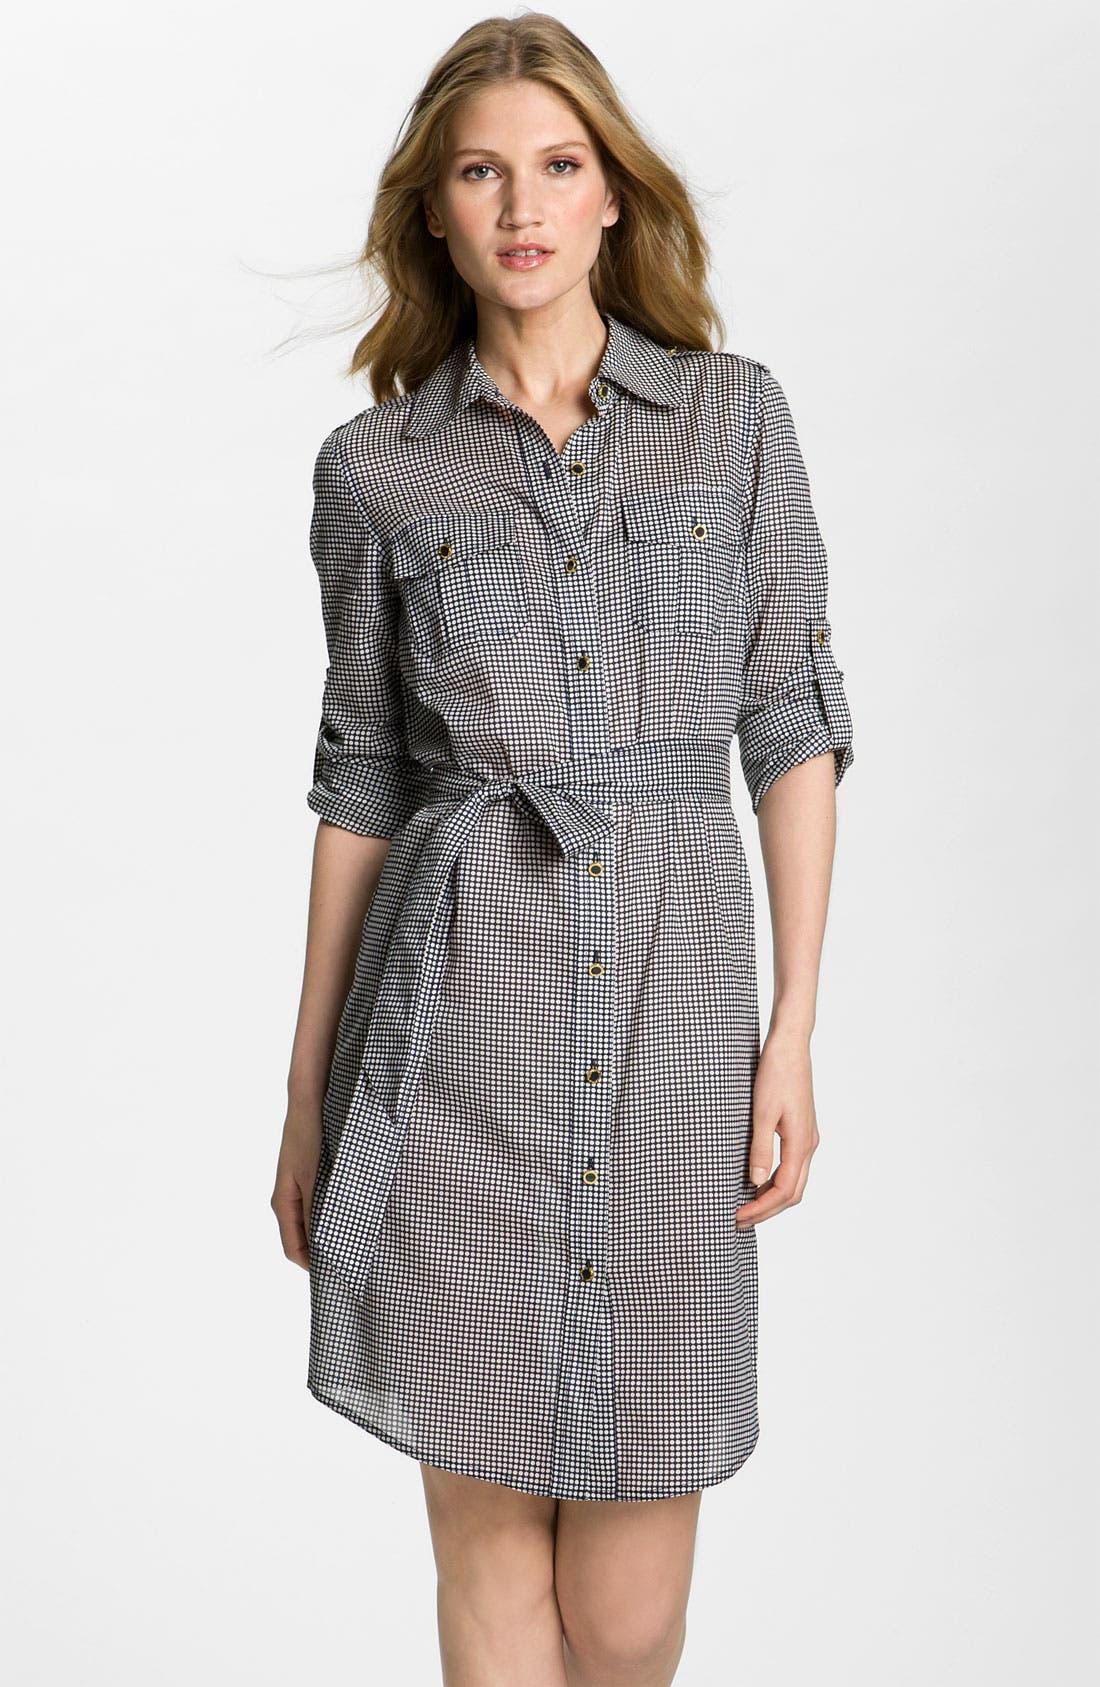 Main Image - Tory Burch 'Brigitte' Gingham Dress